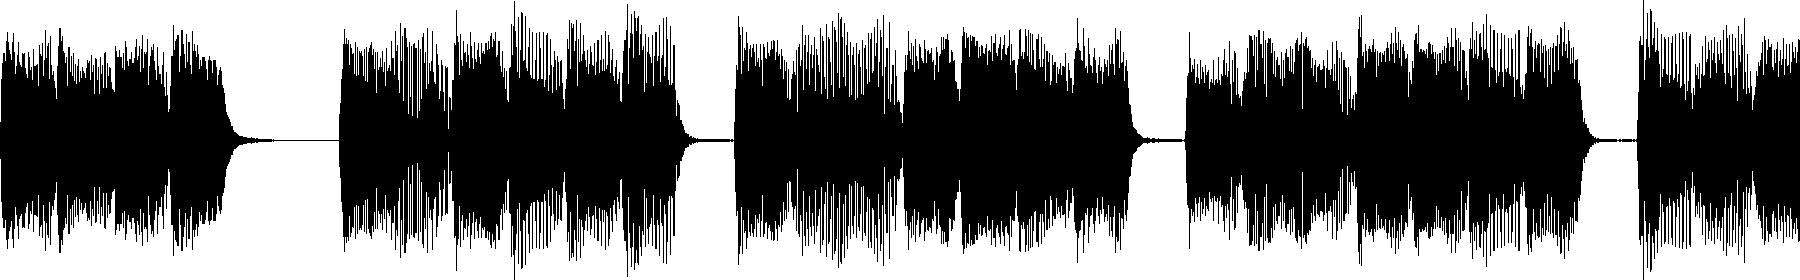 vedh melodyloop 080 fm 124bpm